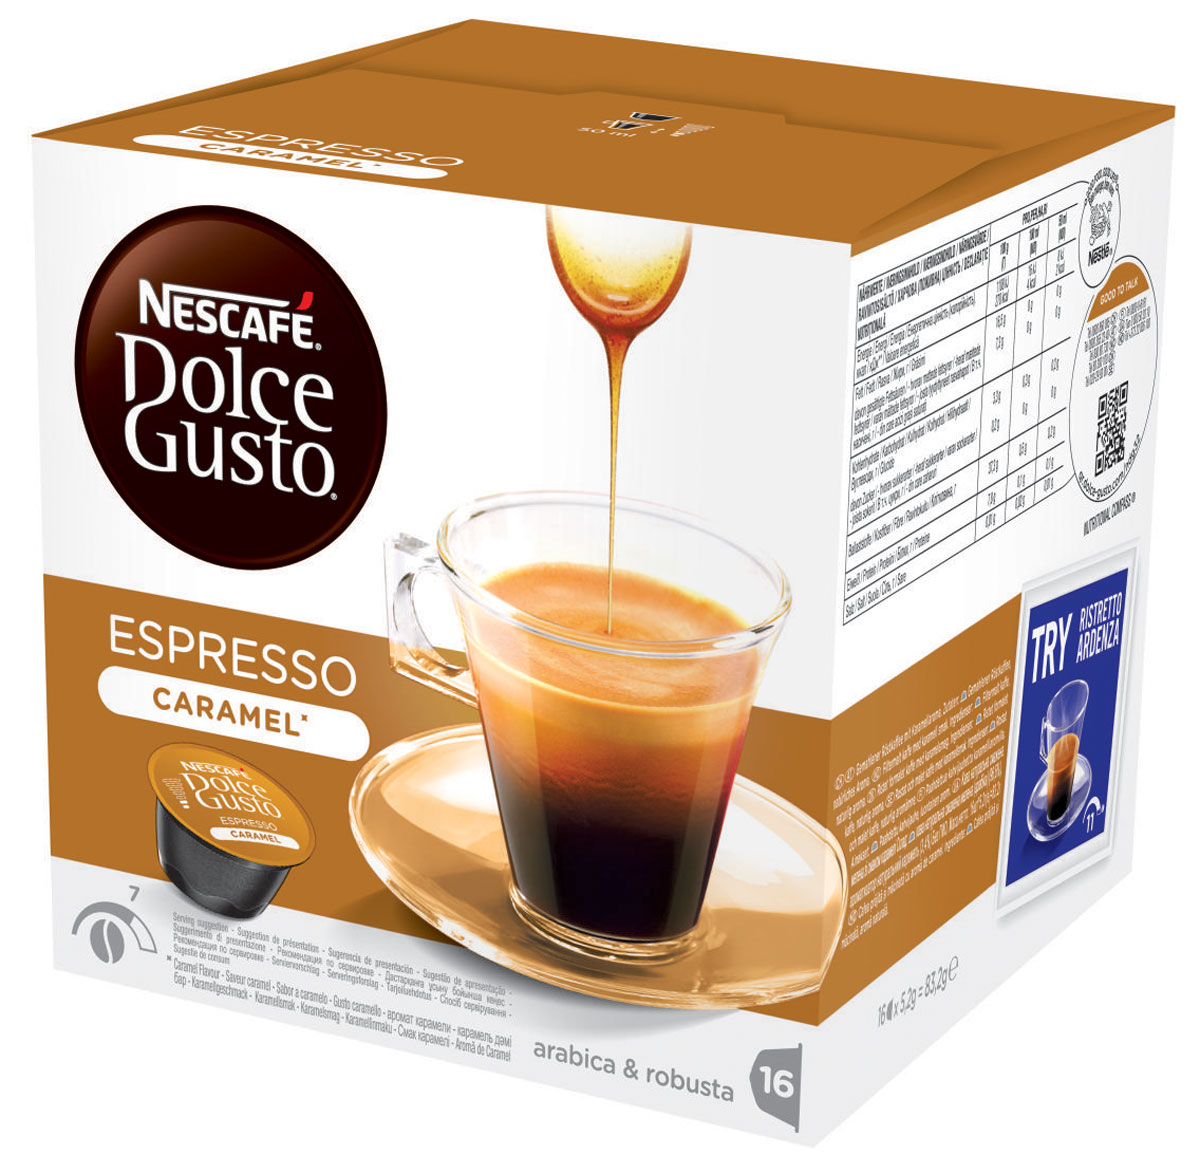 Nescafe Dolce Gusto Espresso Caramel кофе в капсулах, 16 шт tassimo jacobs espresso classico кофе в капсулах 16 шт